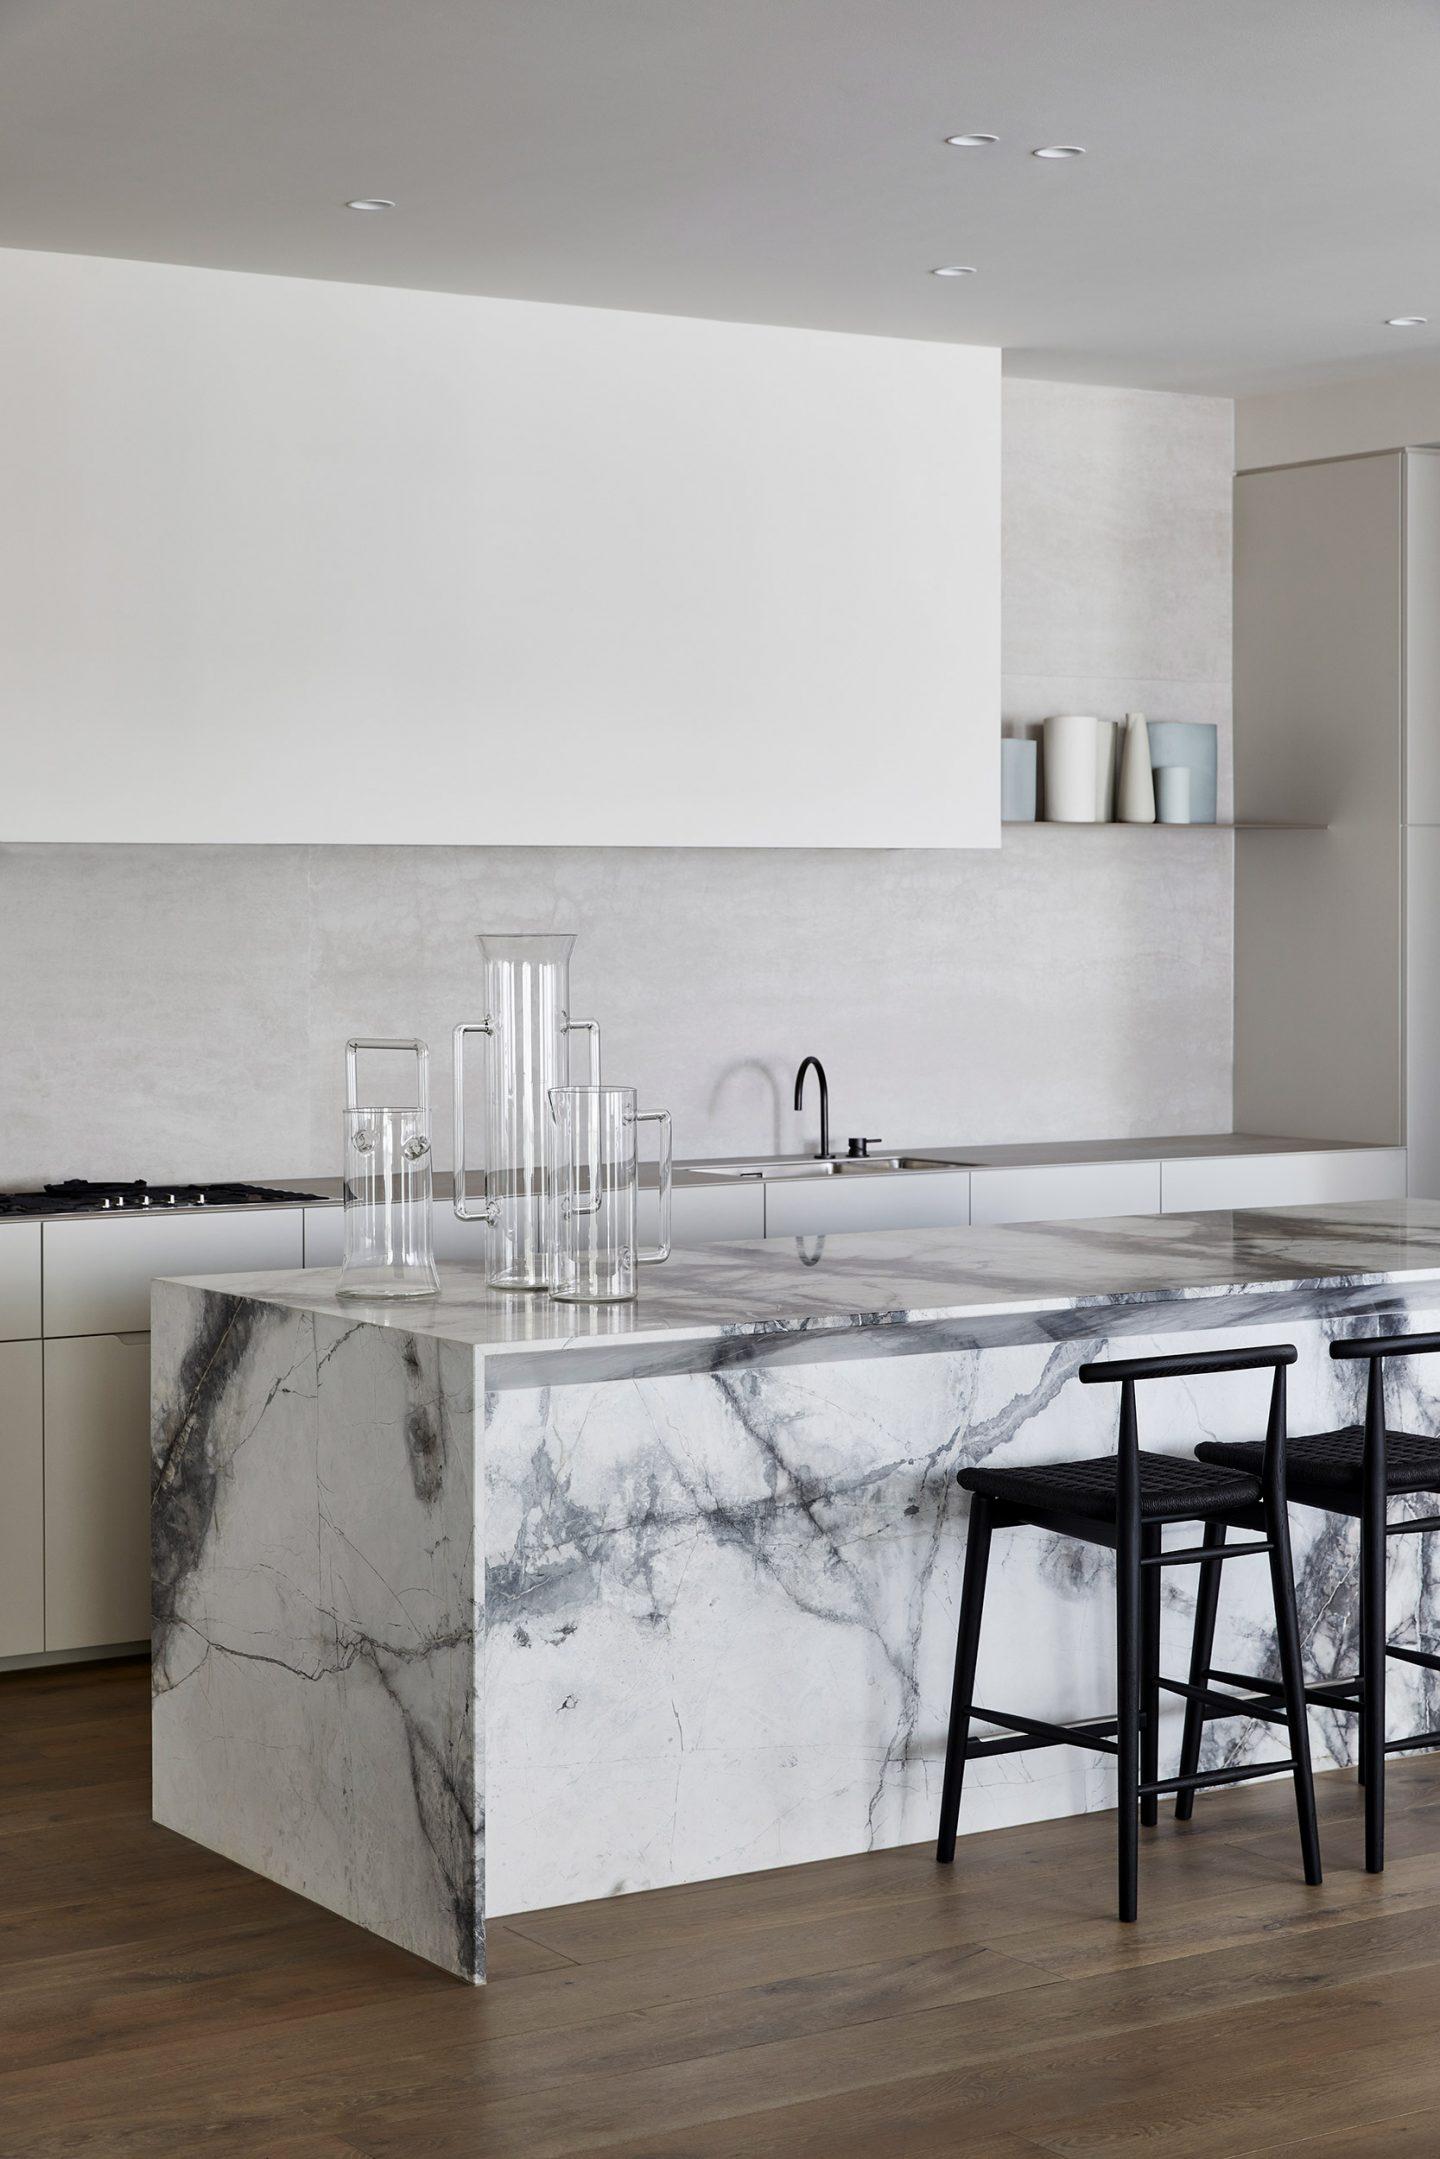 IGNANT-Architecture-Jolson-Huntingtower-Road-014